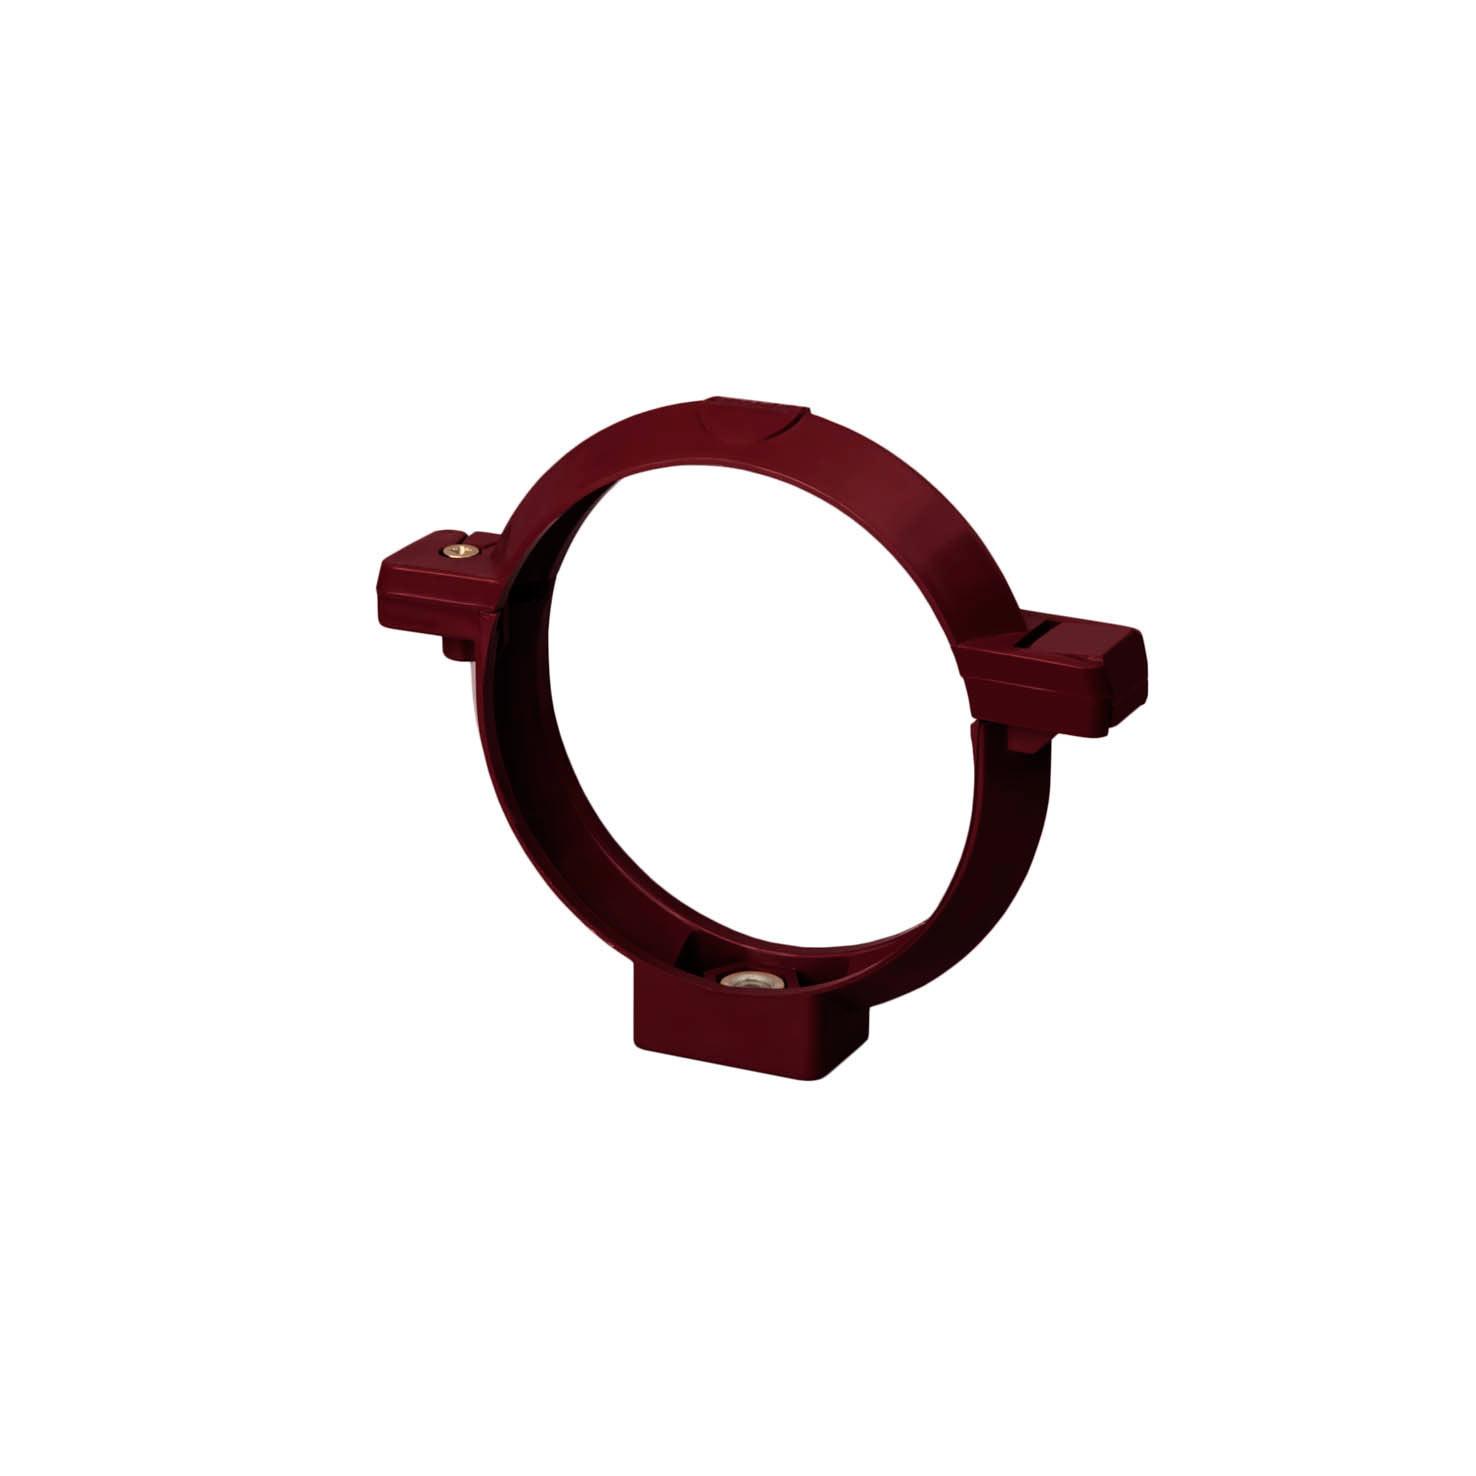 Кронштейн трубы 4 (Красный)